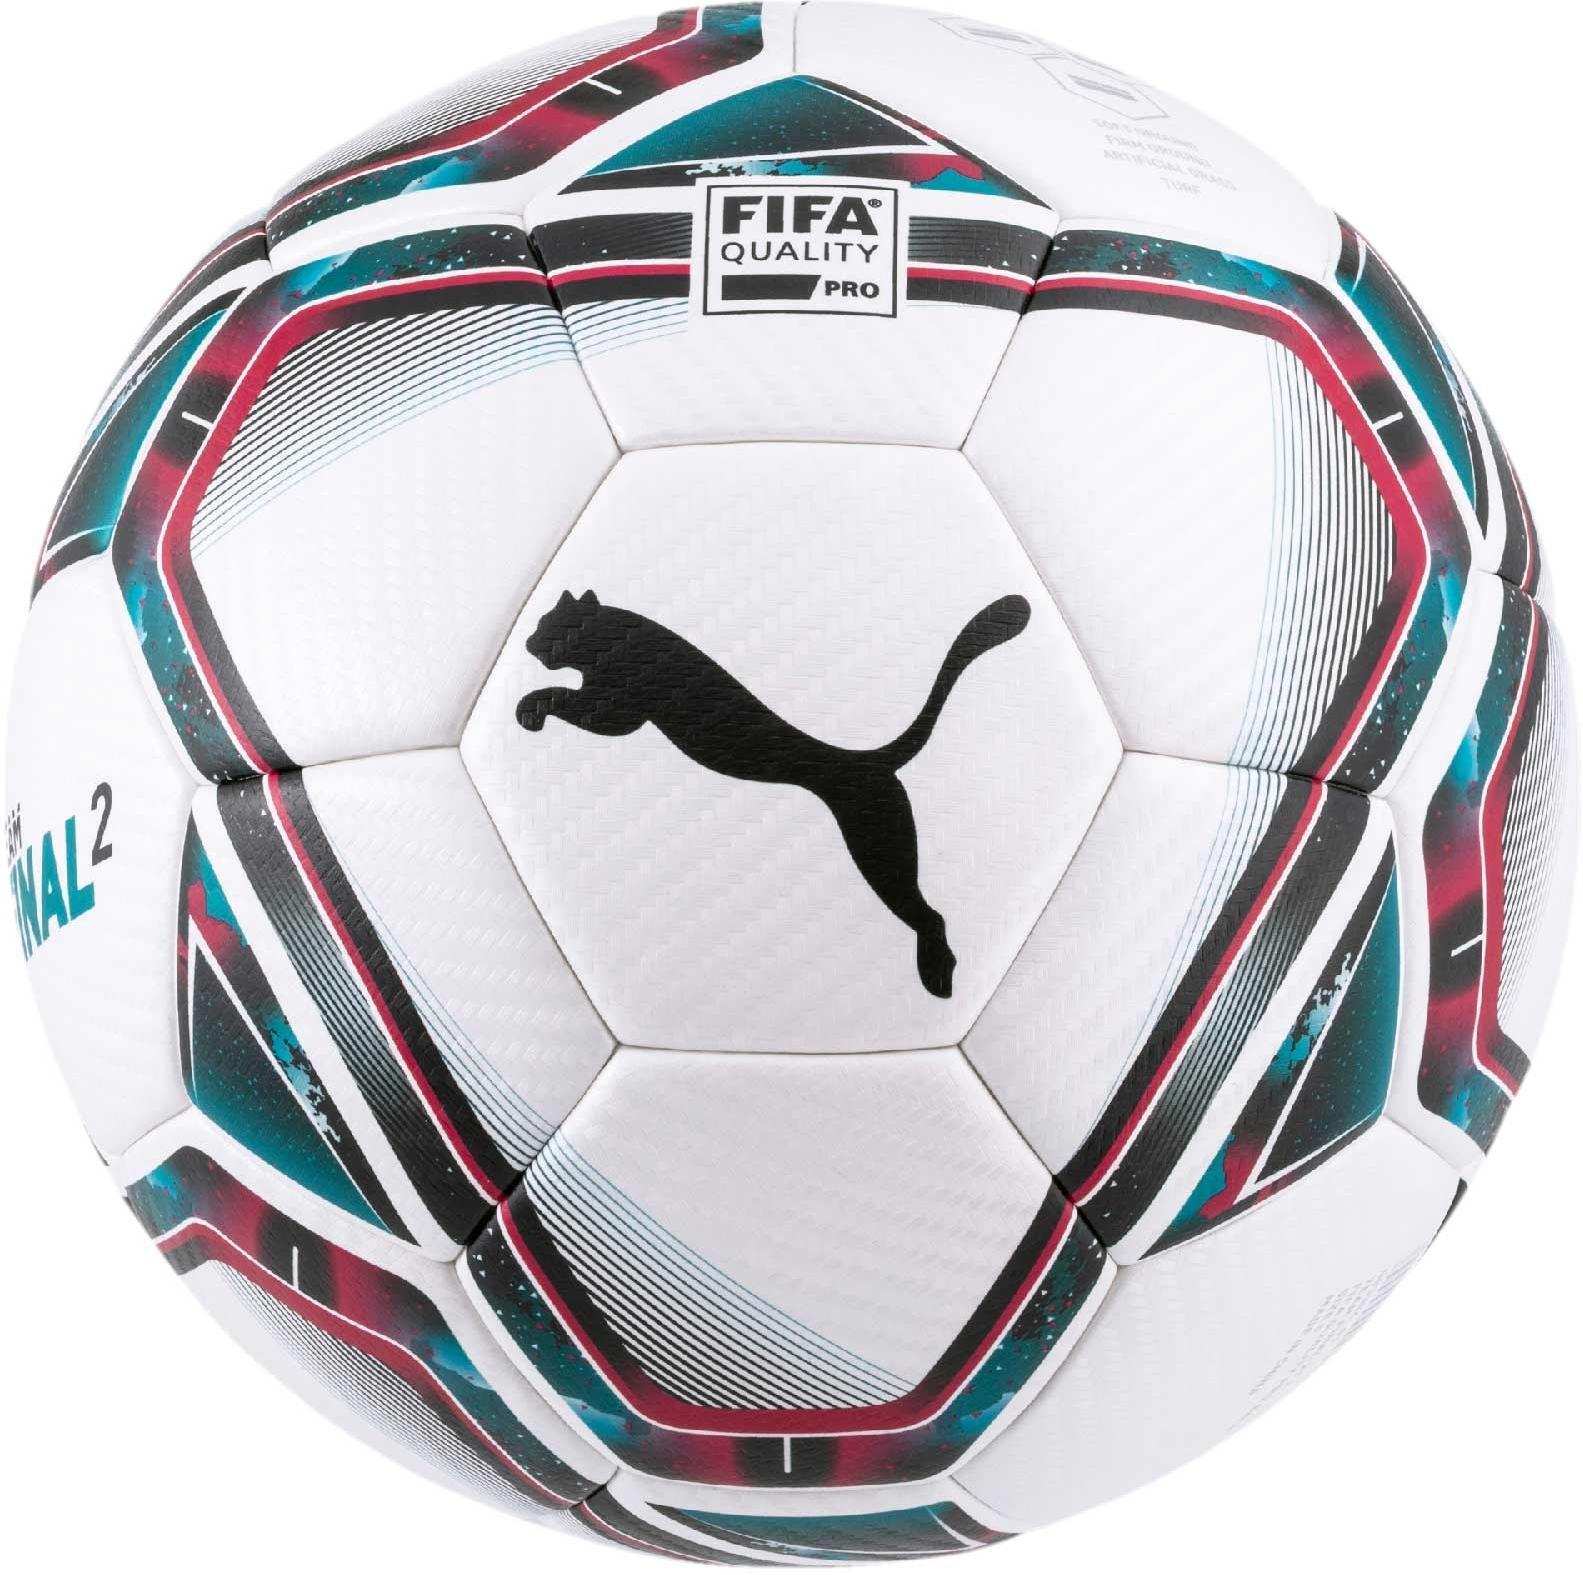 Míč Puma teamFINAL 21.2 FIFA Quality Pro